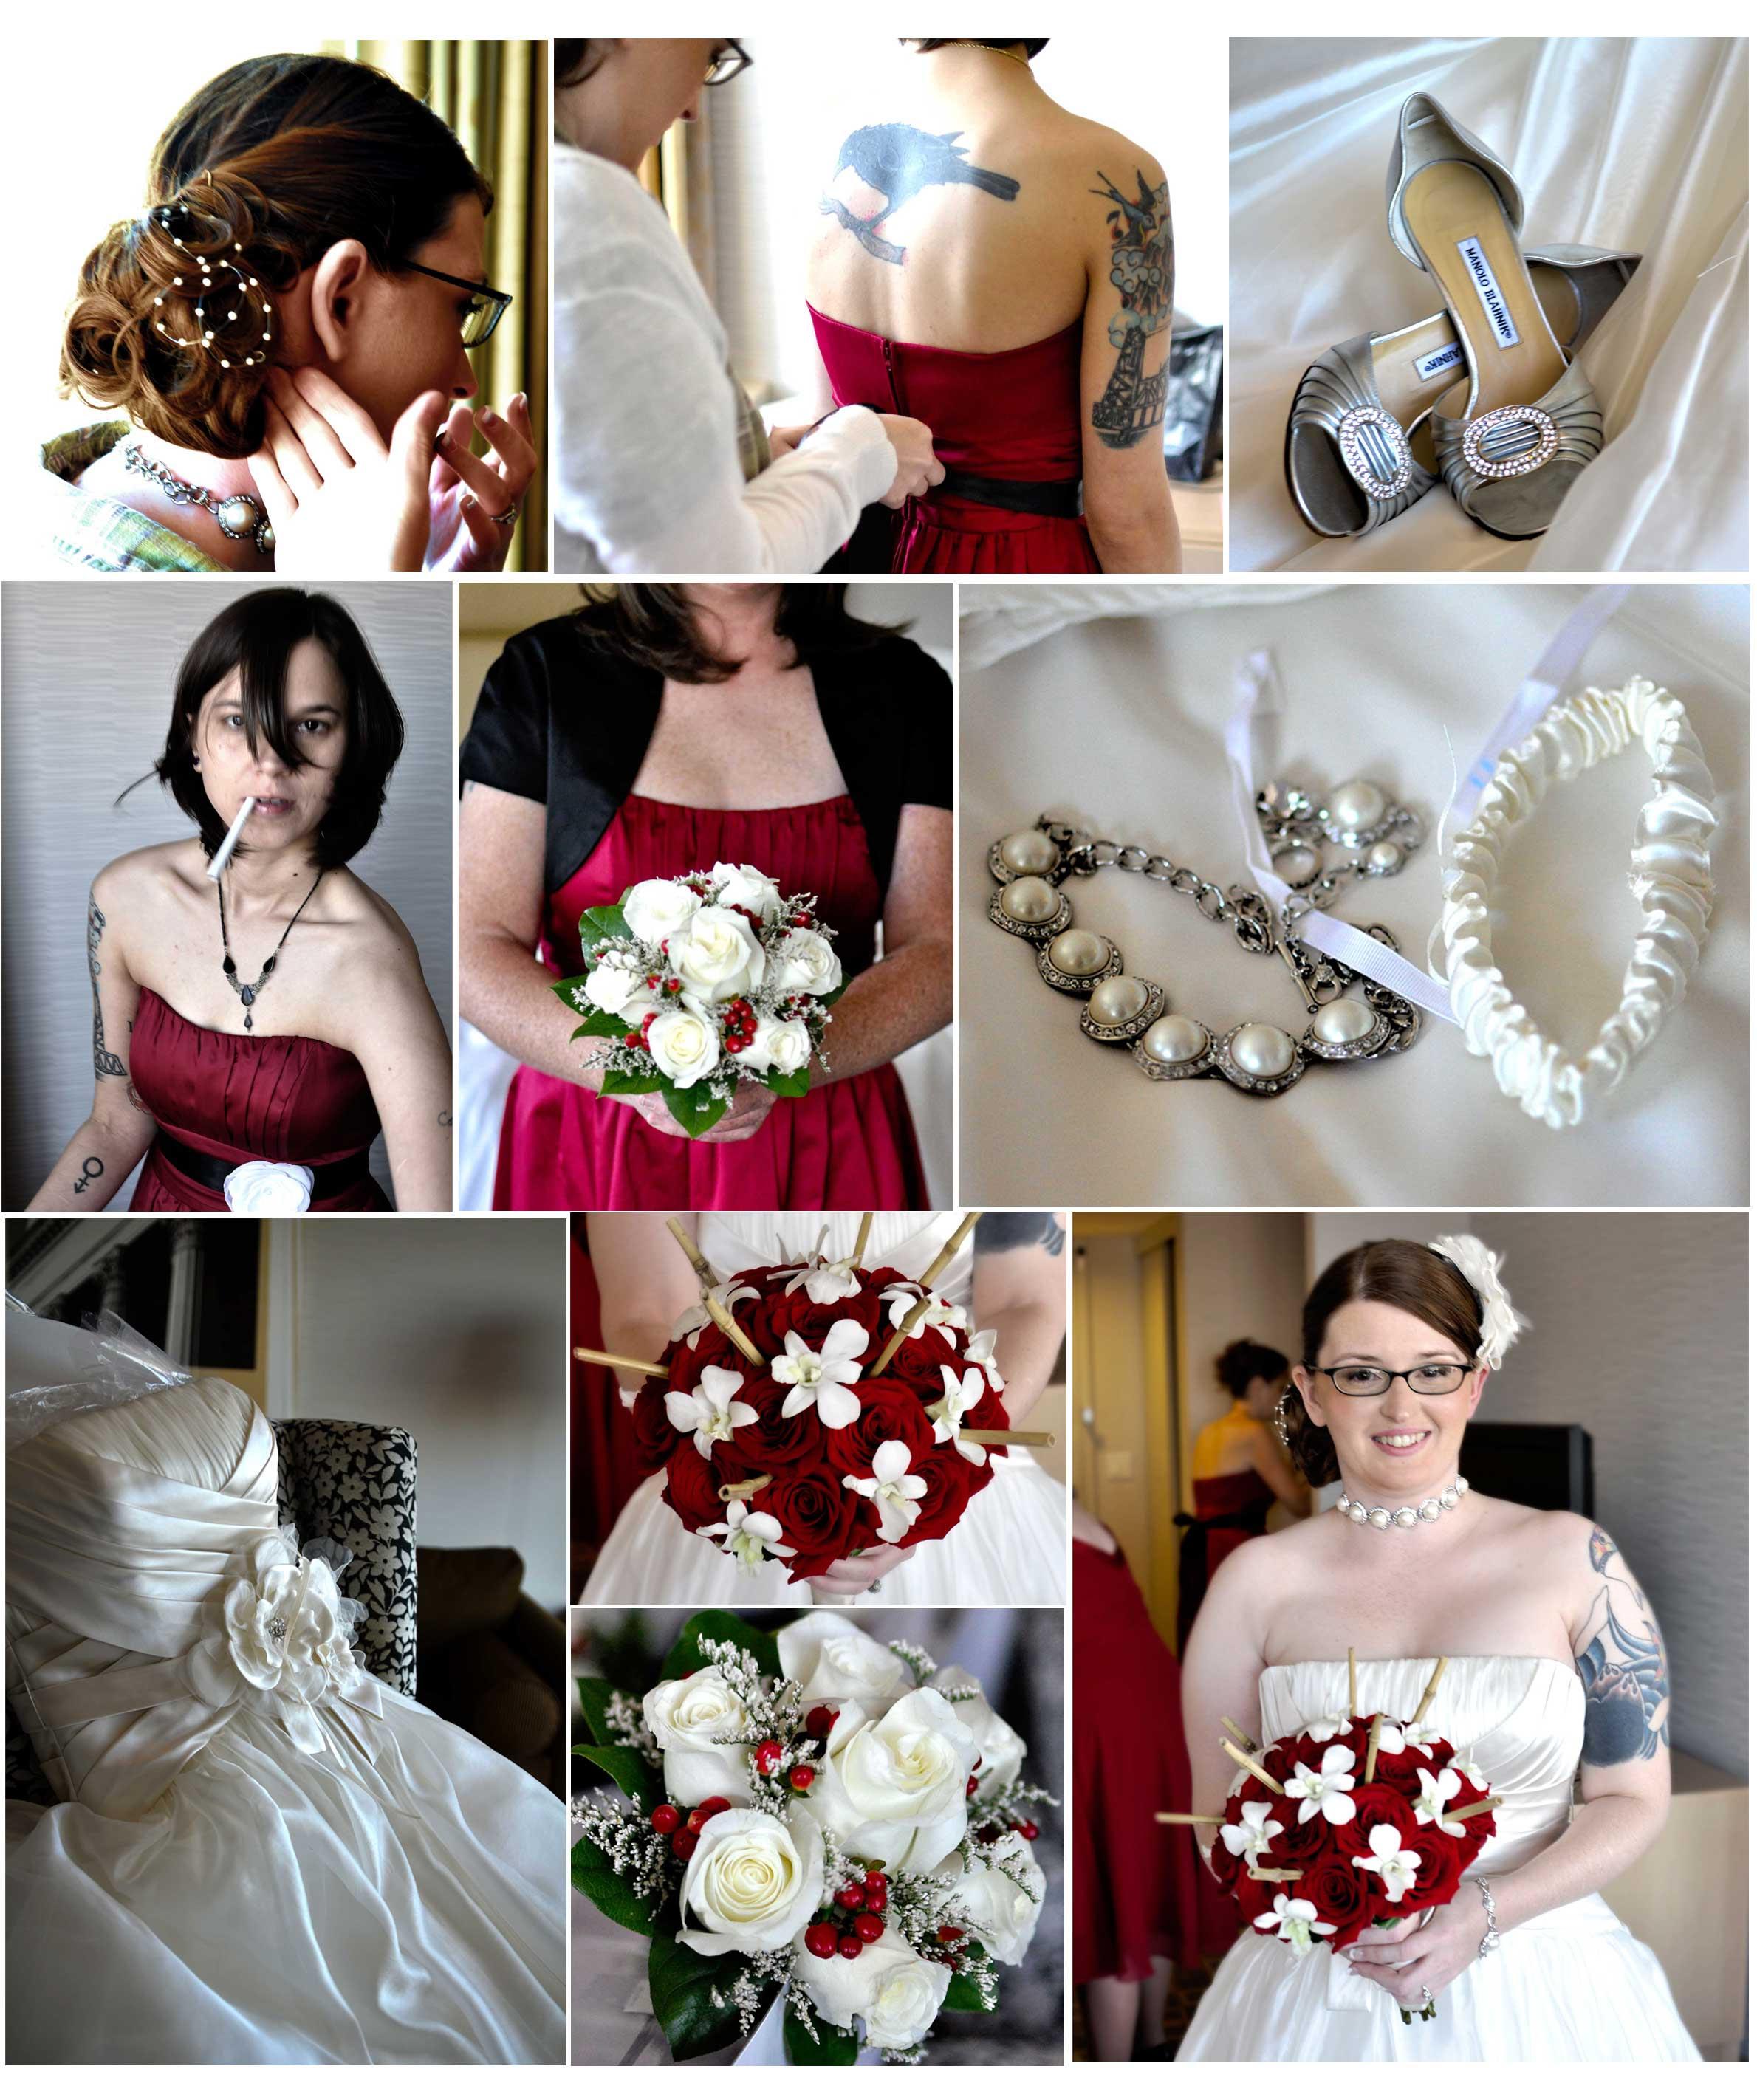 wedding hair accessories, wedding cakes, wedding dresses ring pillow, wedding accessories-92